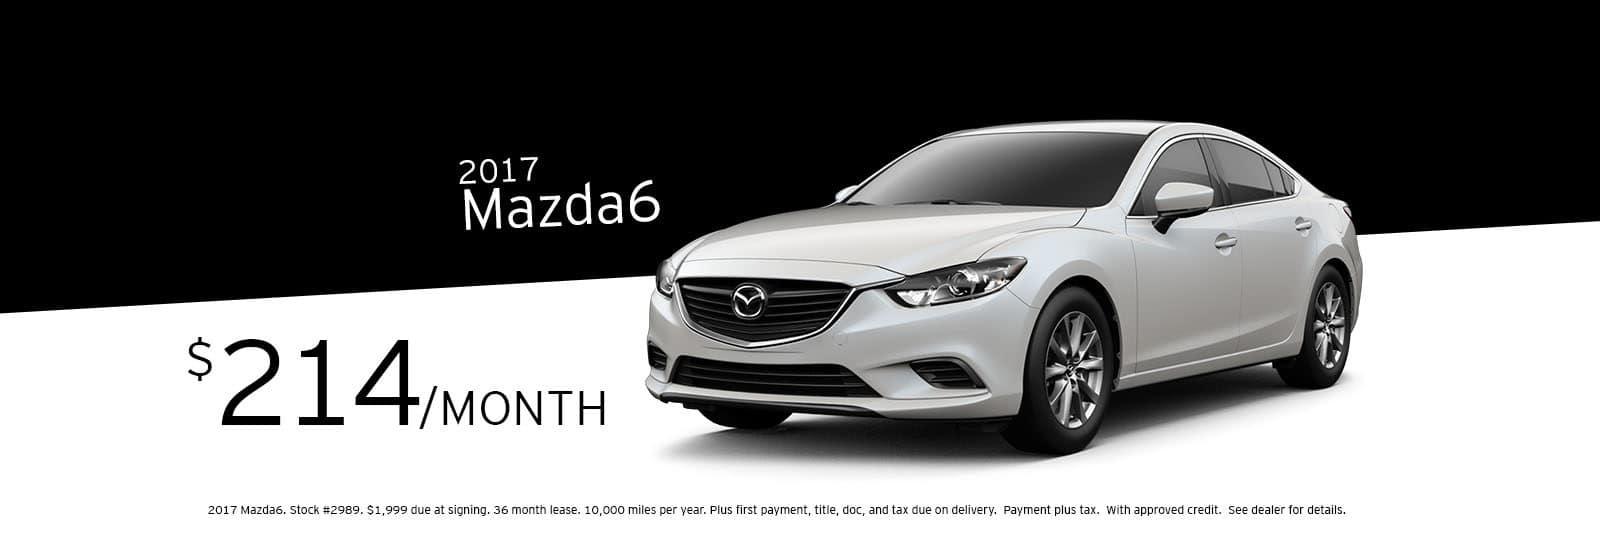 Mazda Dealer in Indianapolis, IN | Ray Skillman Northeast ...